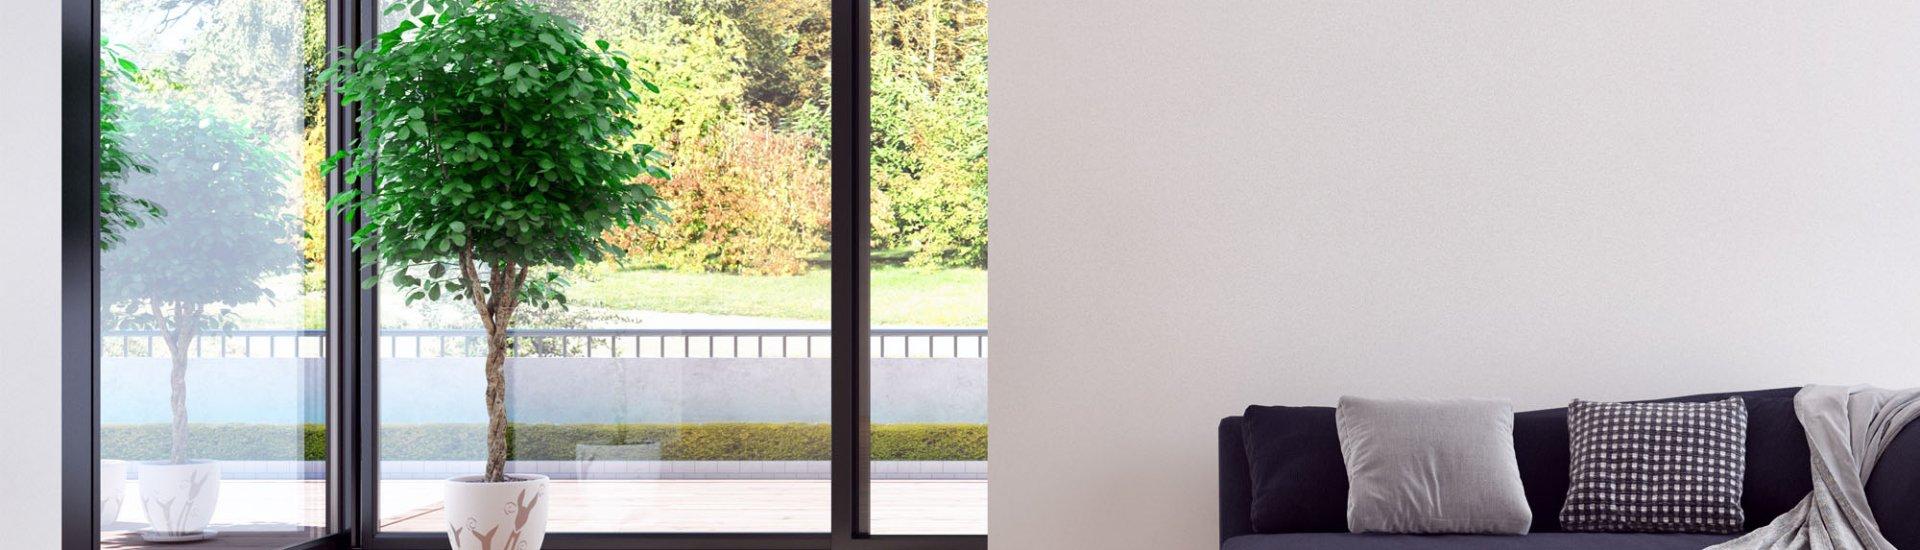 Ilife Saugroboter: Top 3 Modelle & Tipps zur Pflege